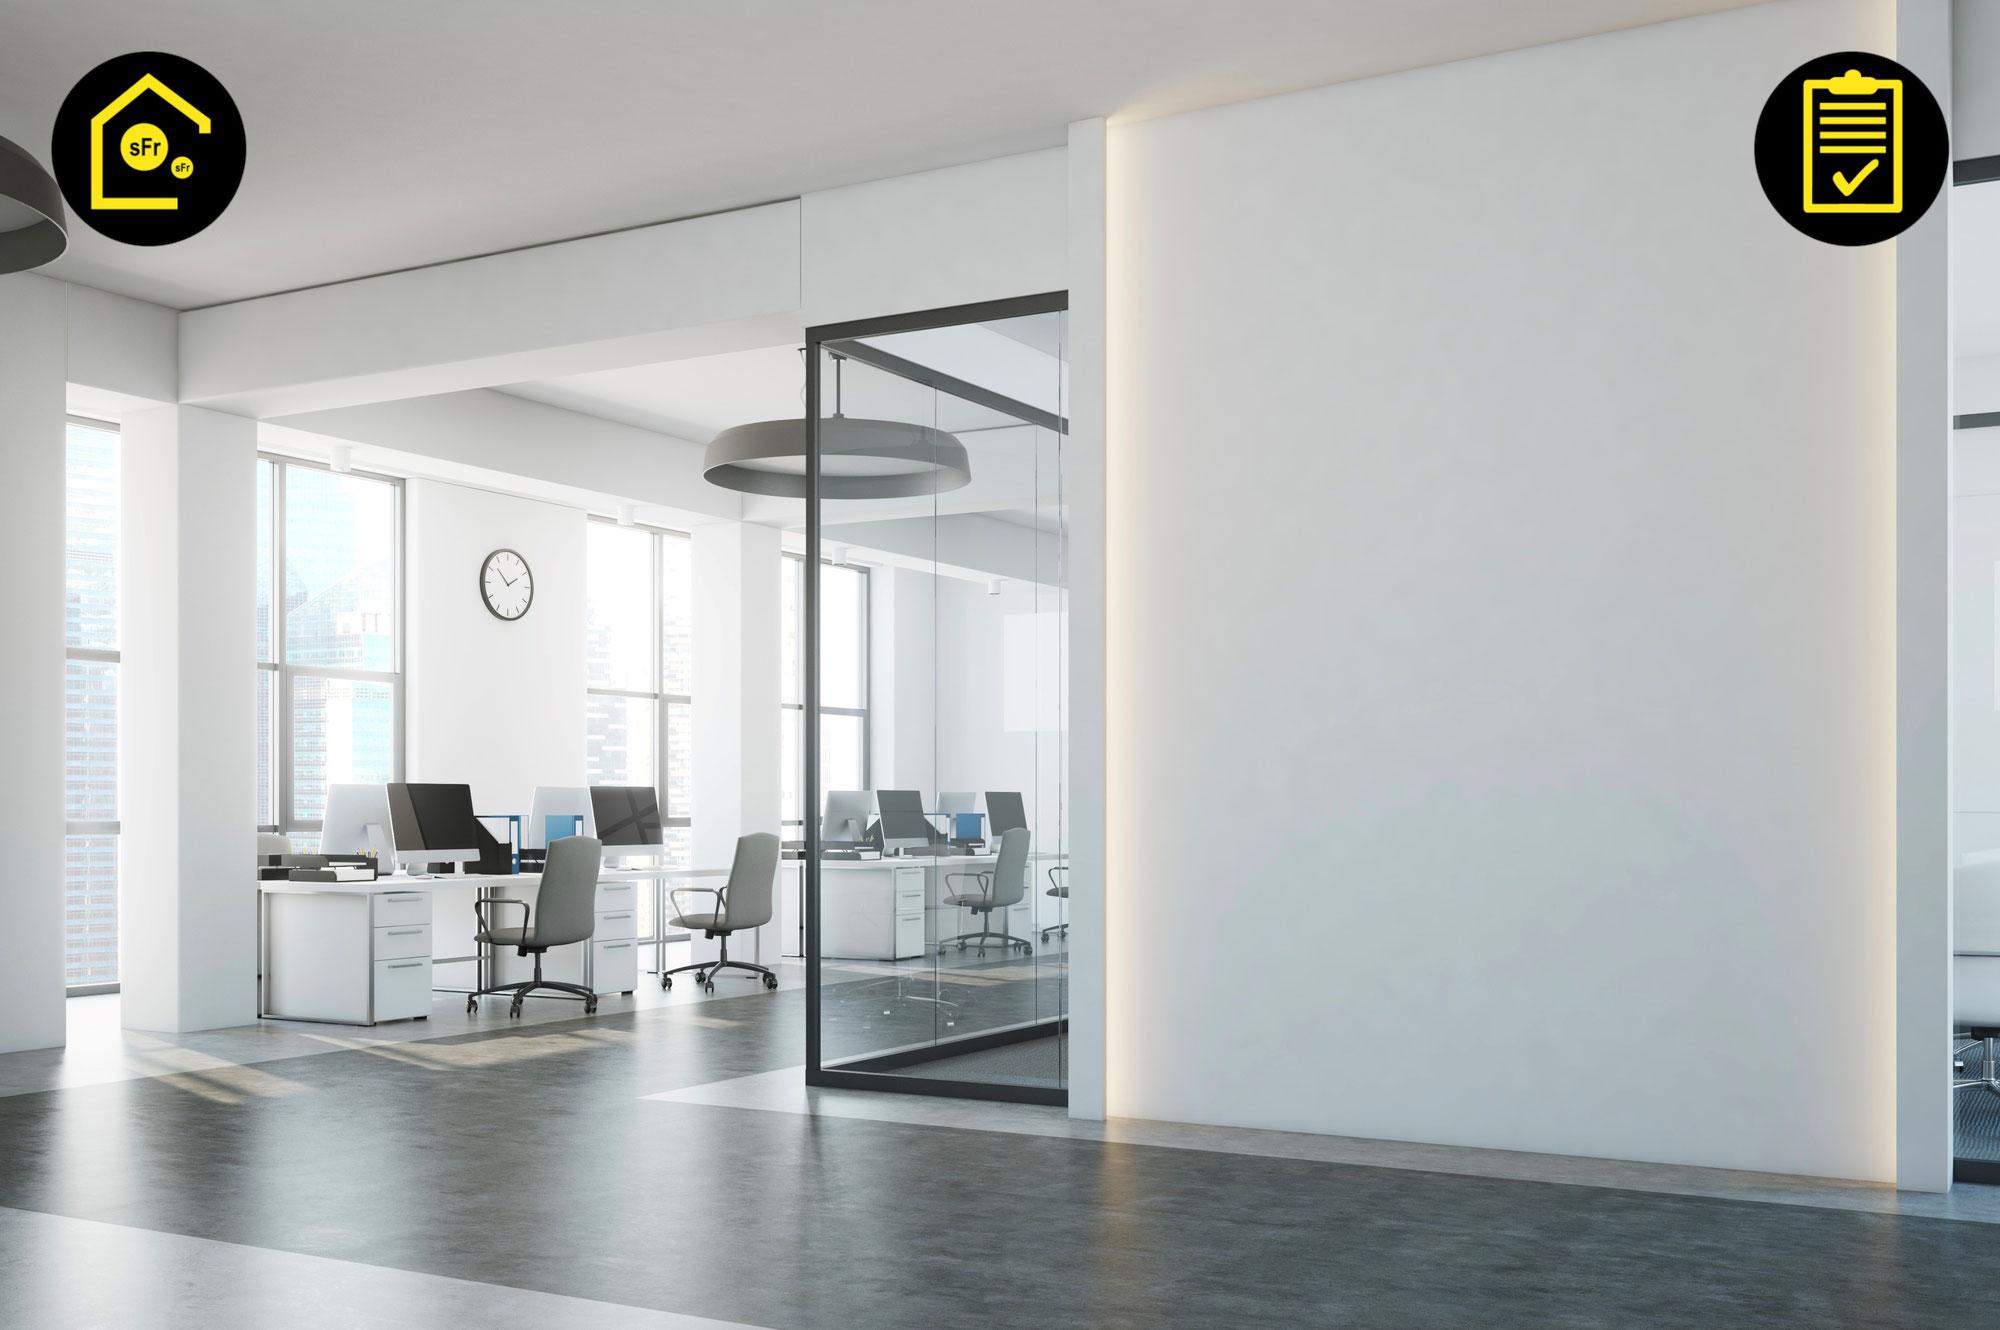 Wohin mit all den leeren Büros?